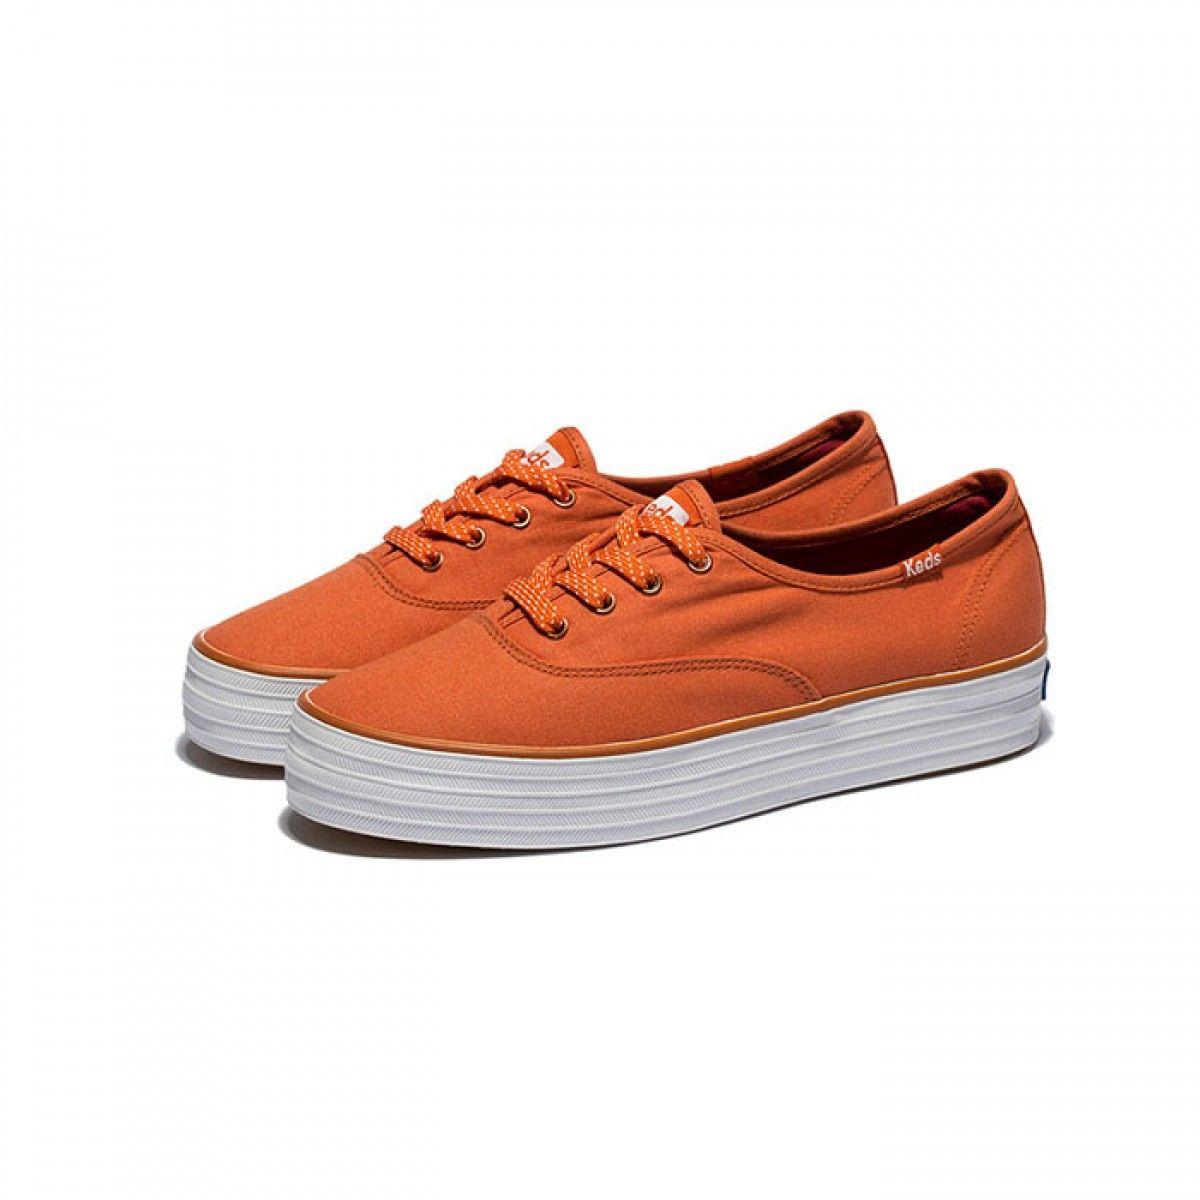 1f97680bf2849 Womens Keds Shoes Orange Champion Triple Classic Canvas